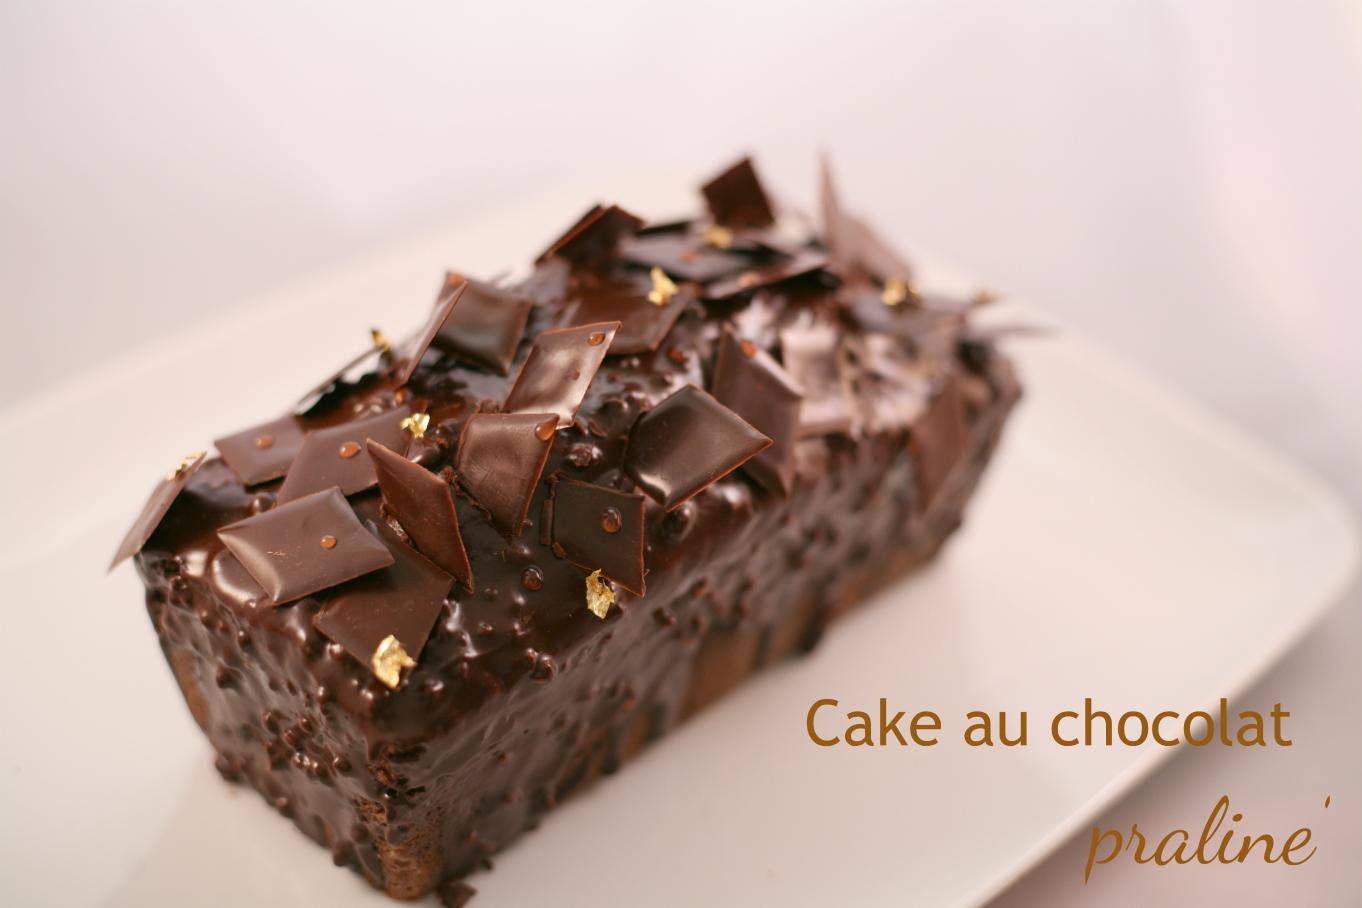 I dolci di pinella pierre herm for Cake au chocolat pierre herme